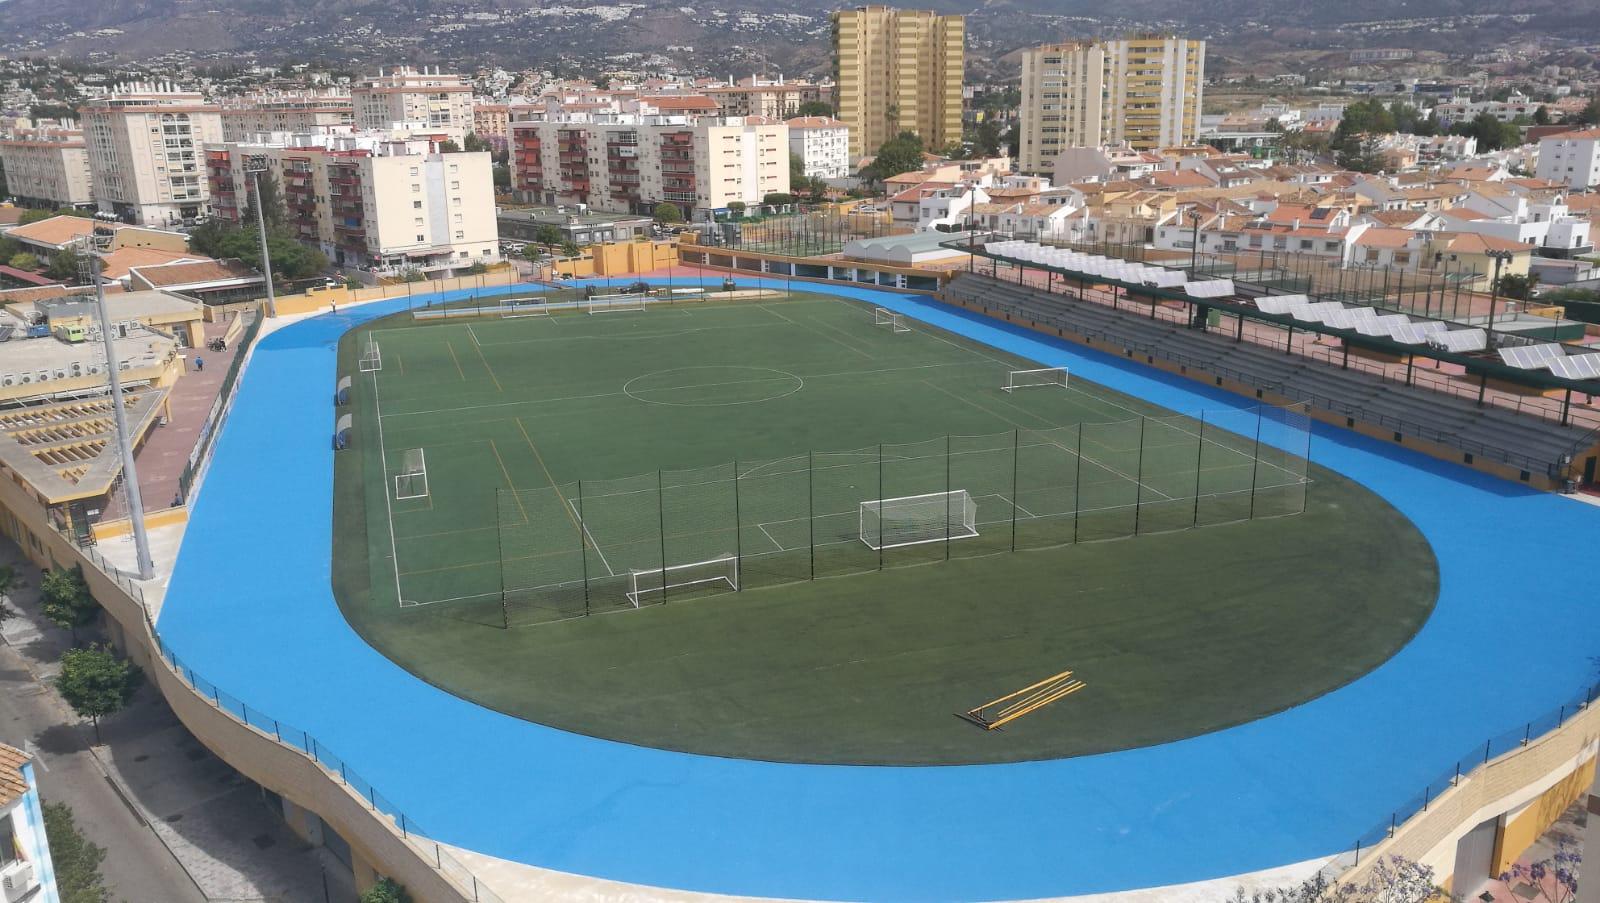 Complejo Deportivo Municipal Elola, Fuengirola Image